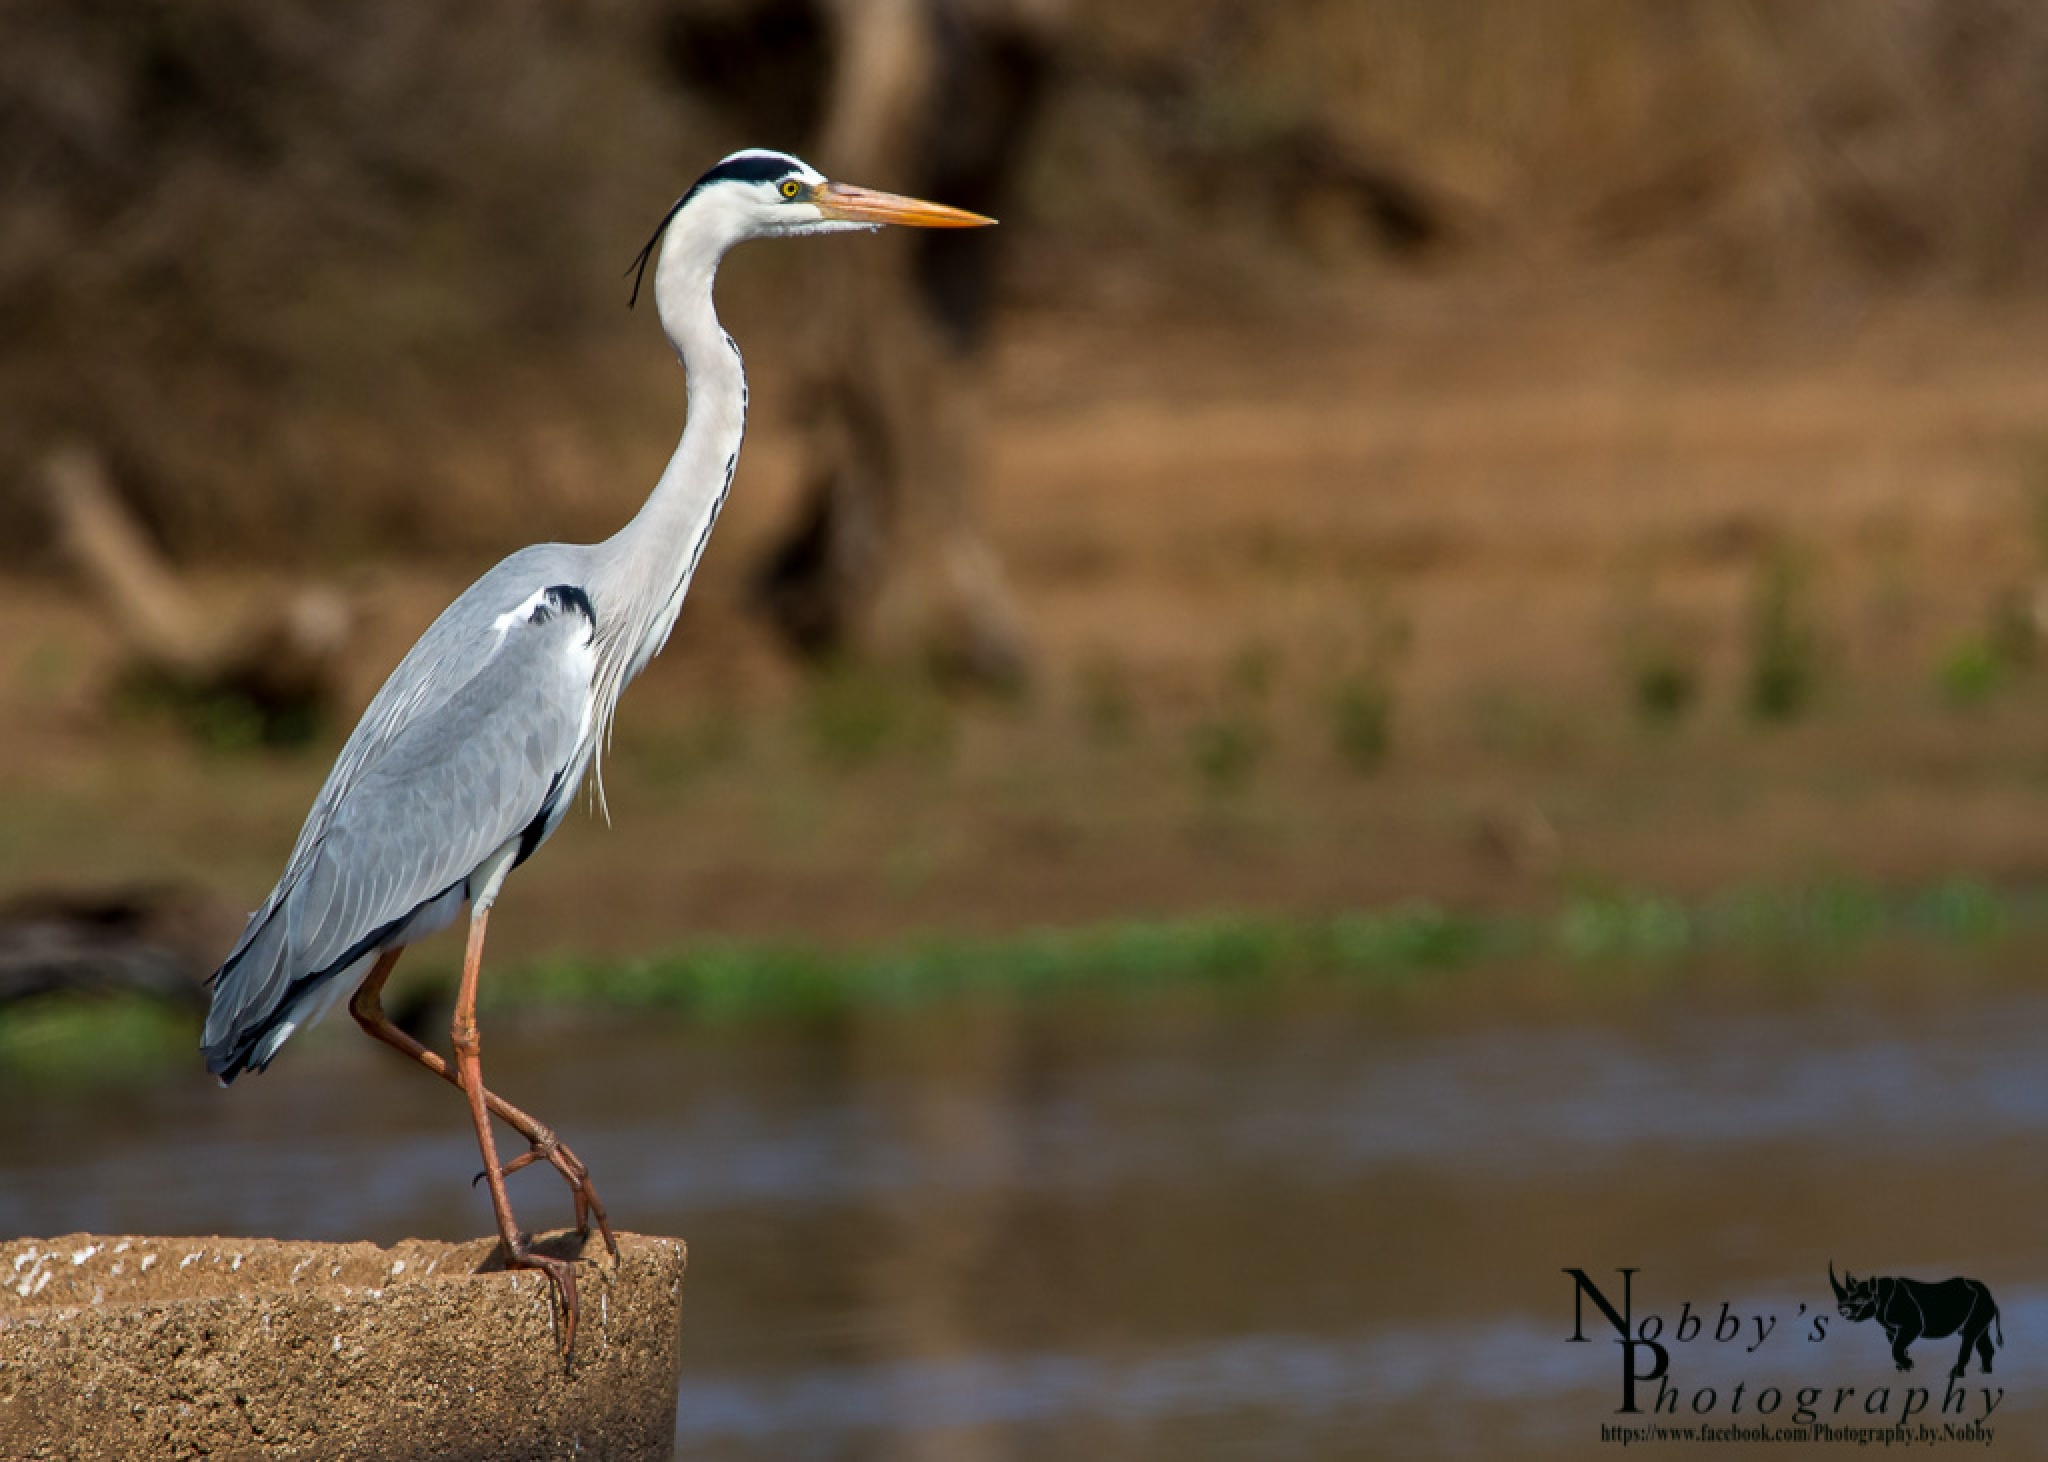 Grey Heron by Nobby Clarke